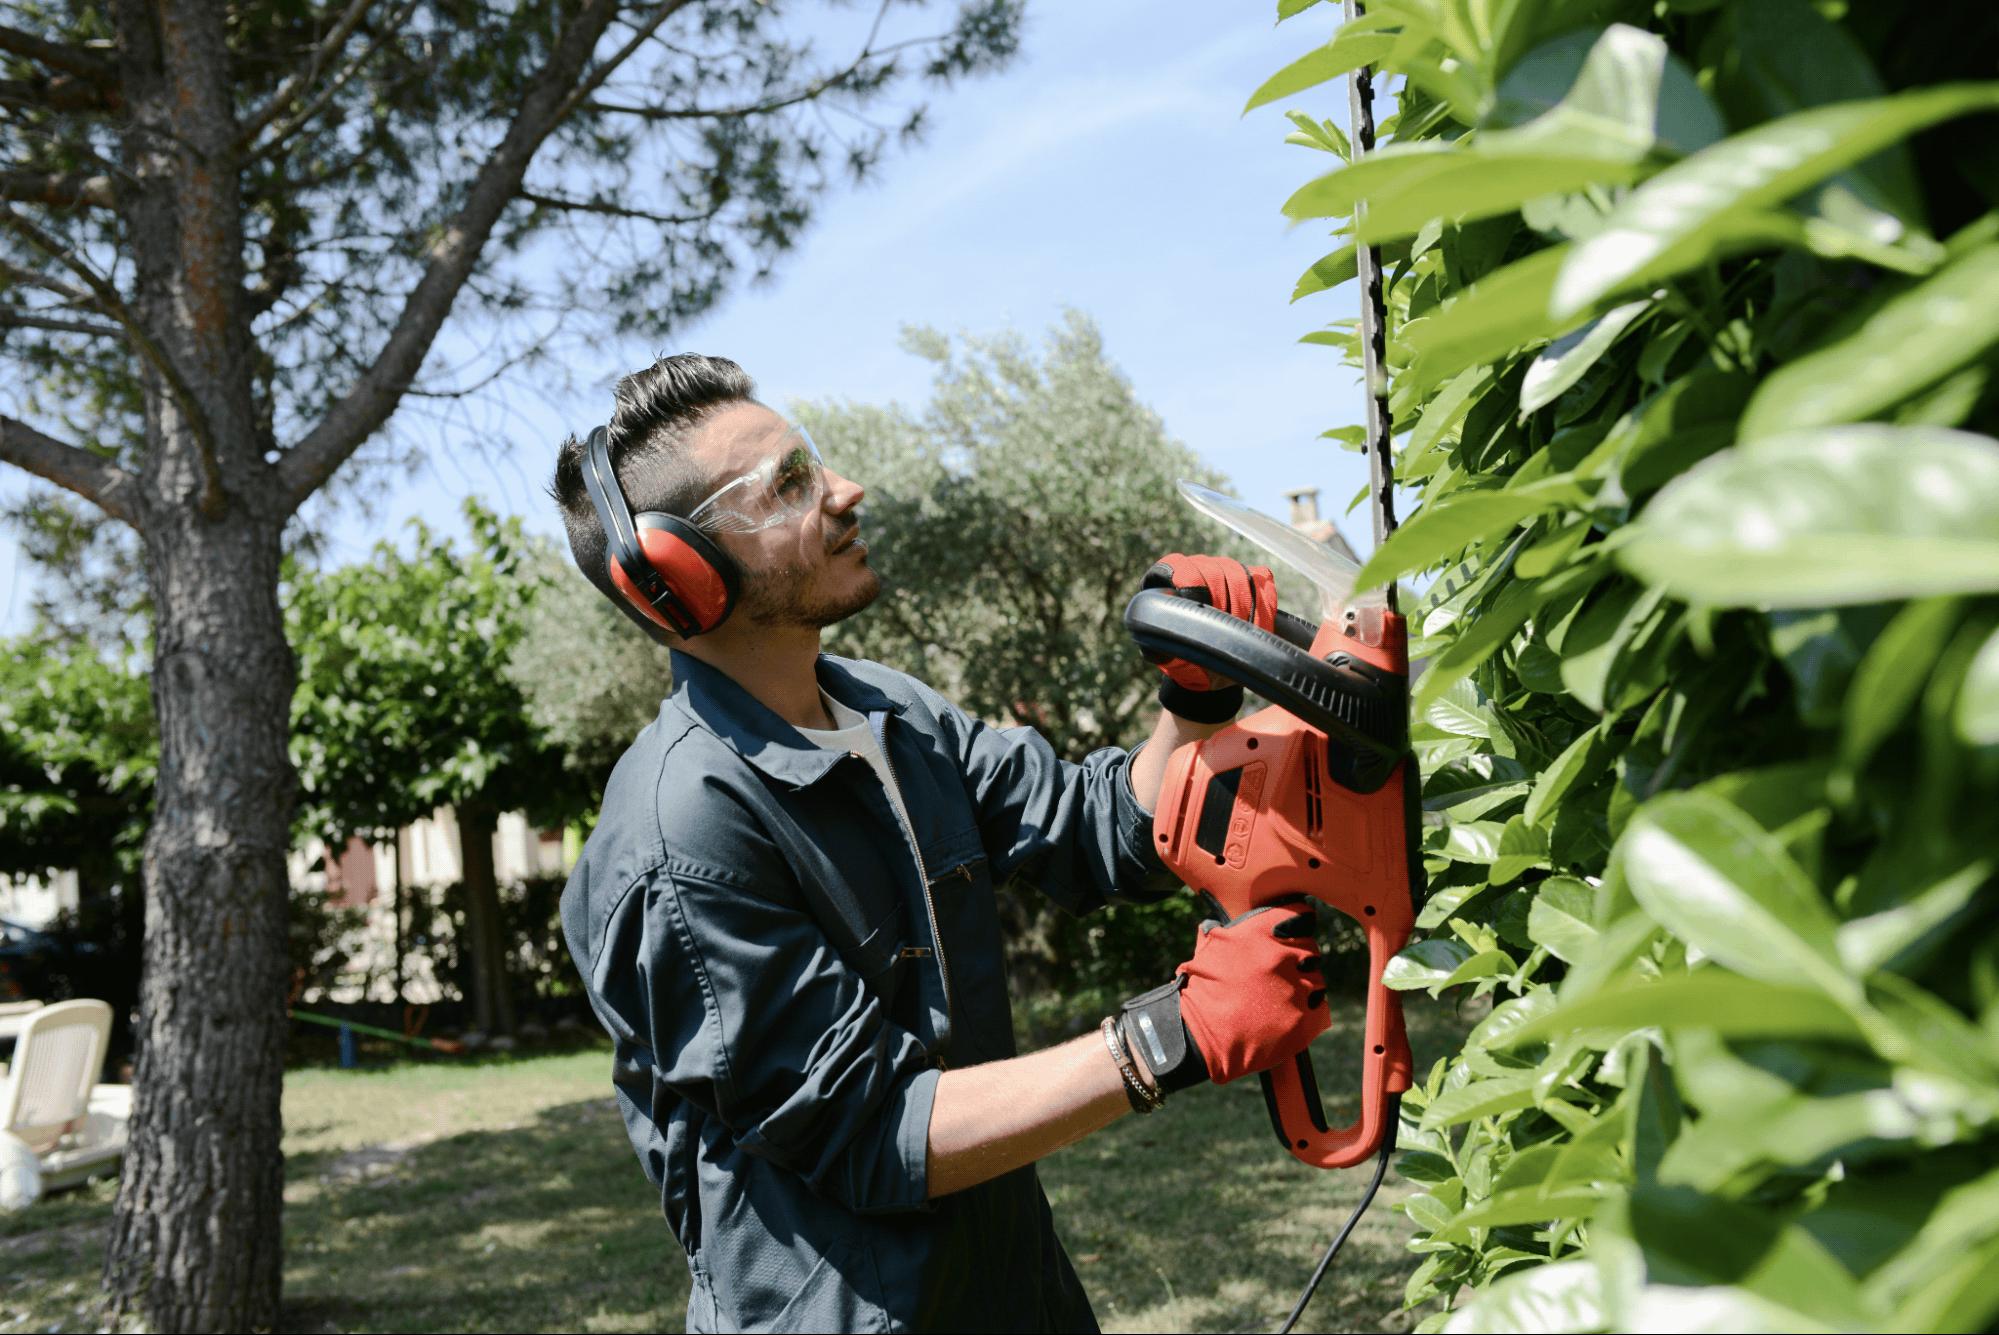 Prep bushes